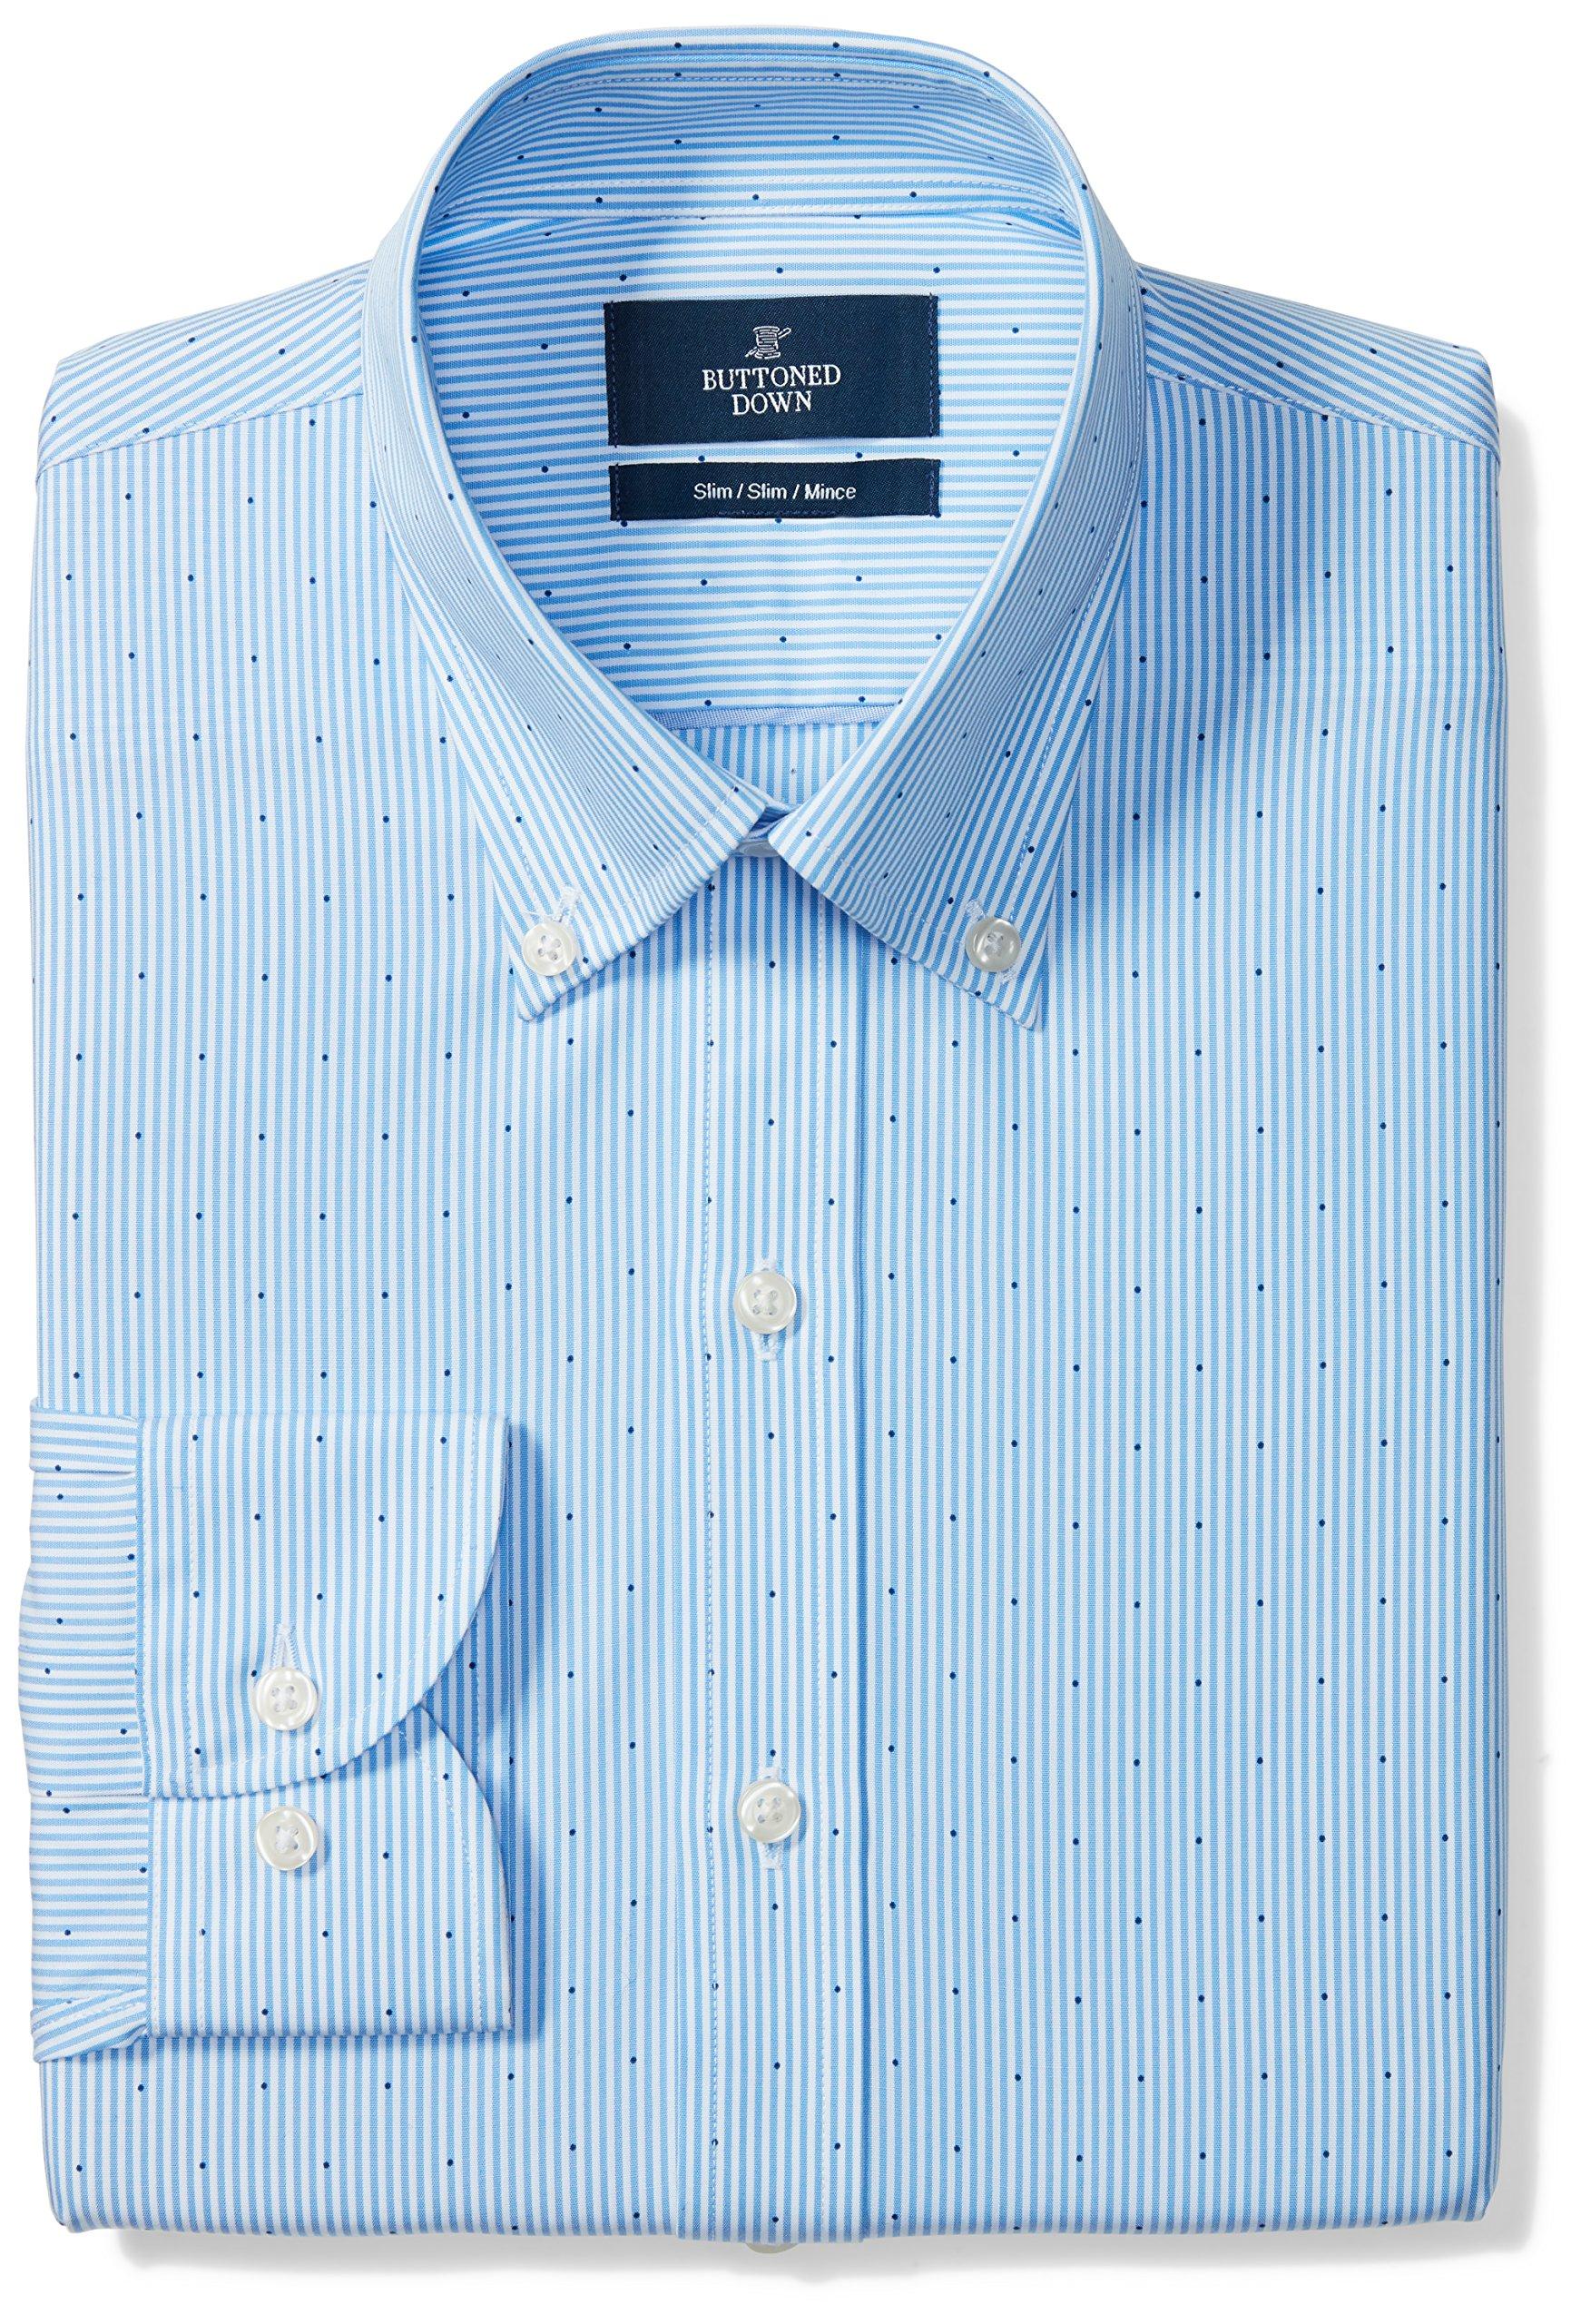 Buttoned Down Men's Slim Fit Button-Collar Pattern Non-Iron Dress Shirt, Light Blue Stripe Dot, 17.5'' Neck 34'' Sleeve